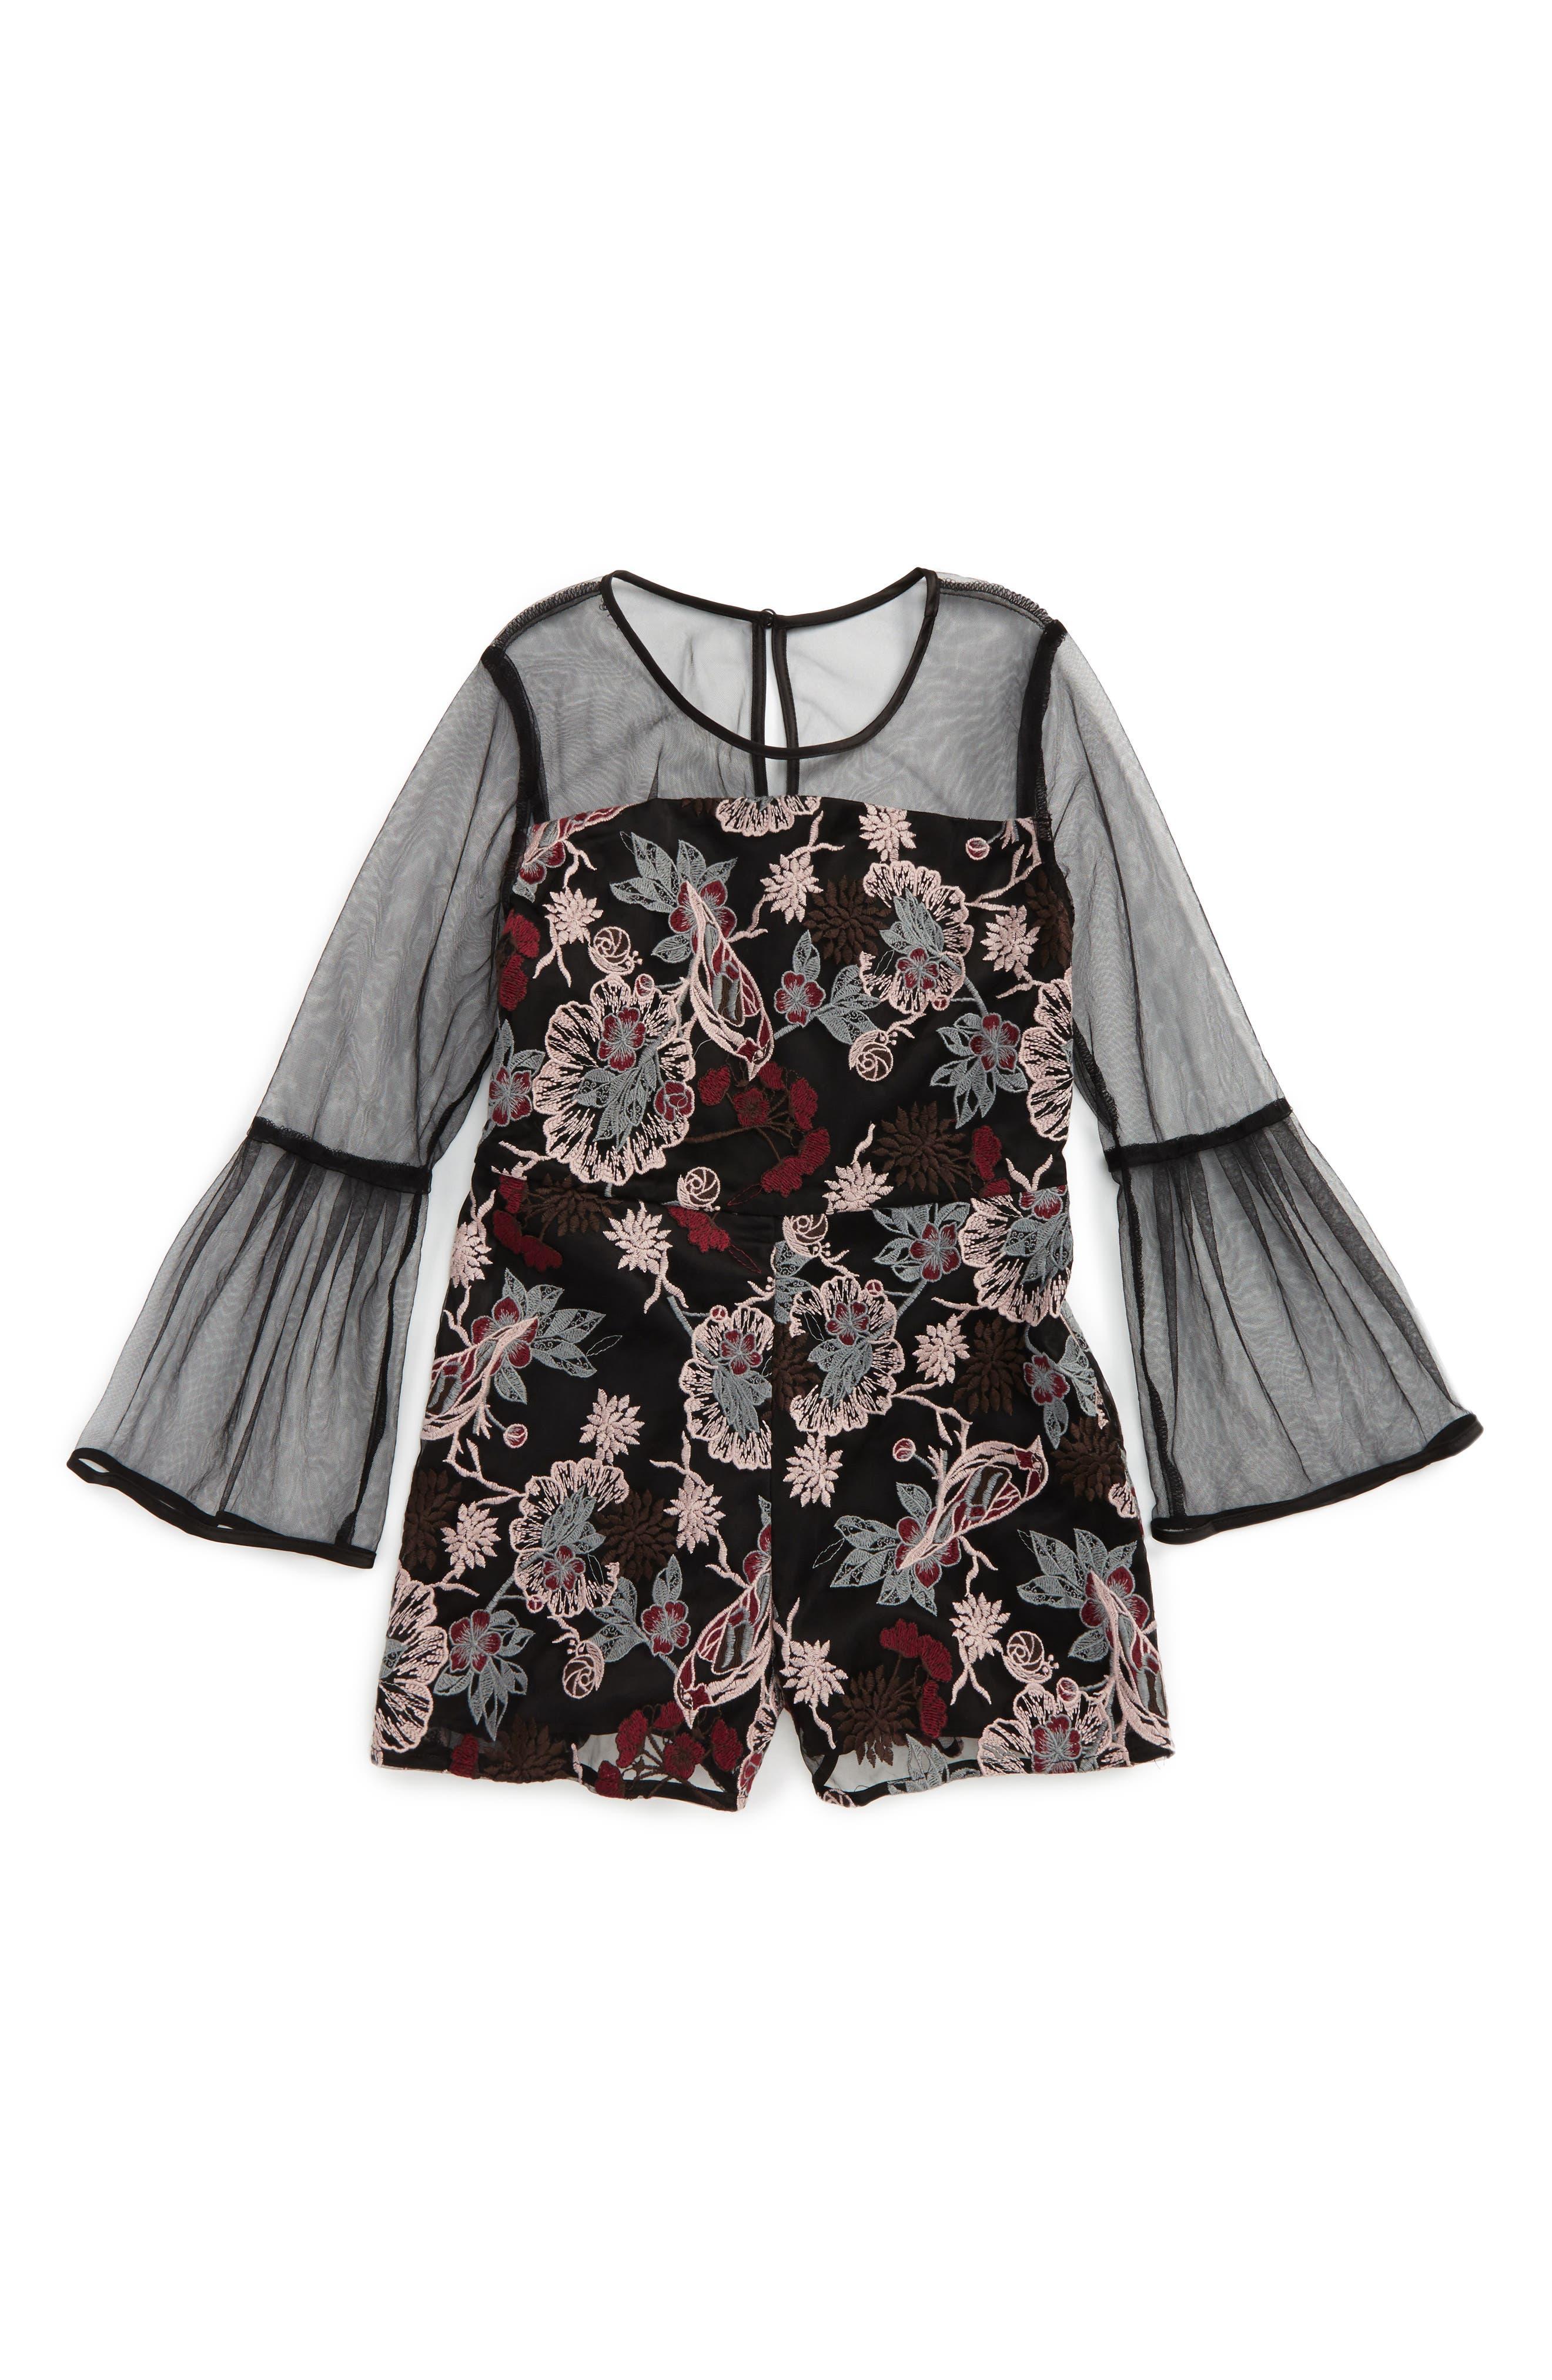 Alternate Image 1 Selected - Bardot Junior Embroidered Romper (Big Girls)